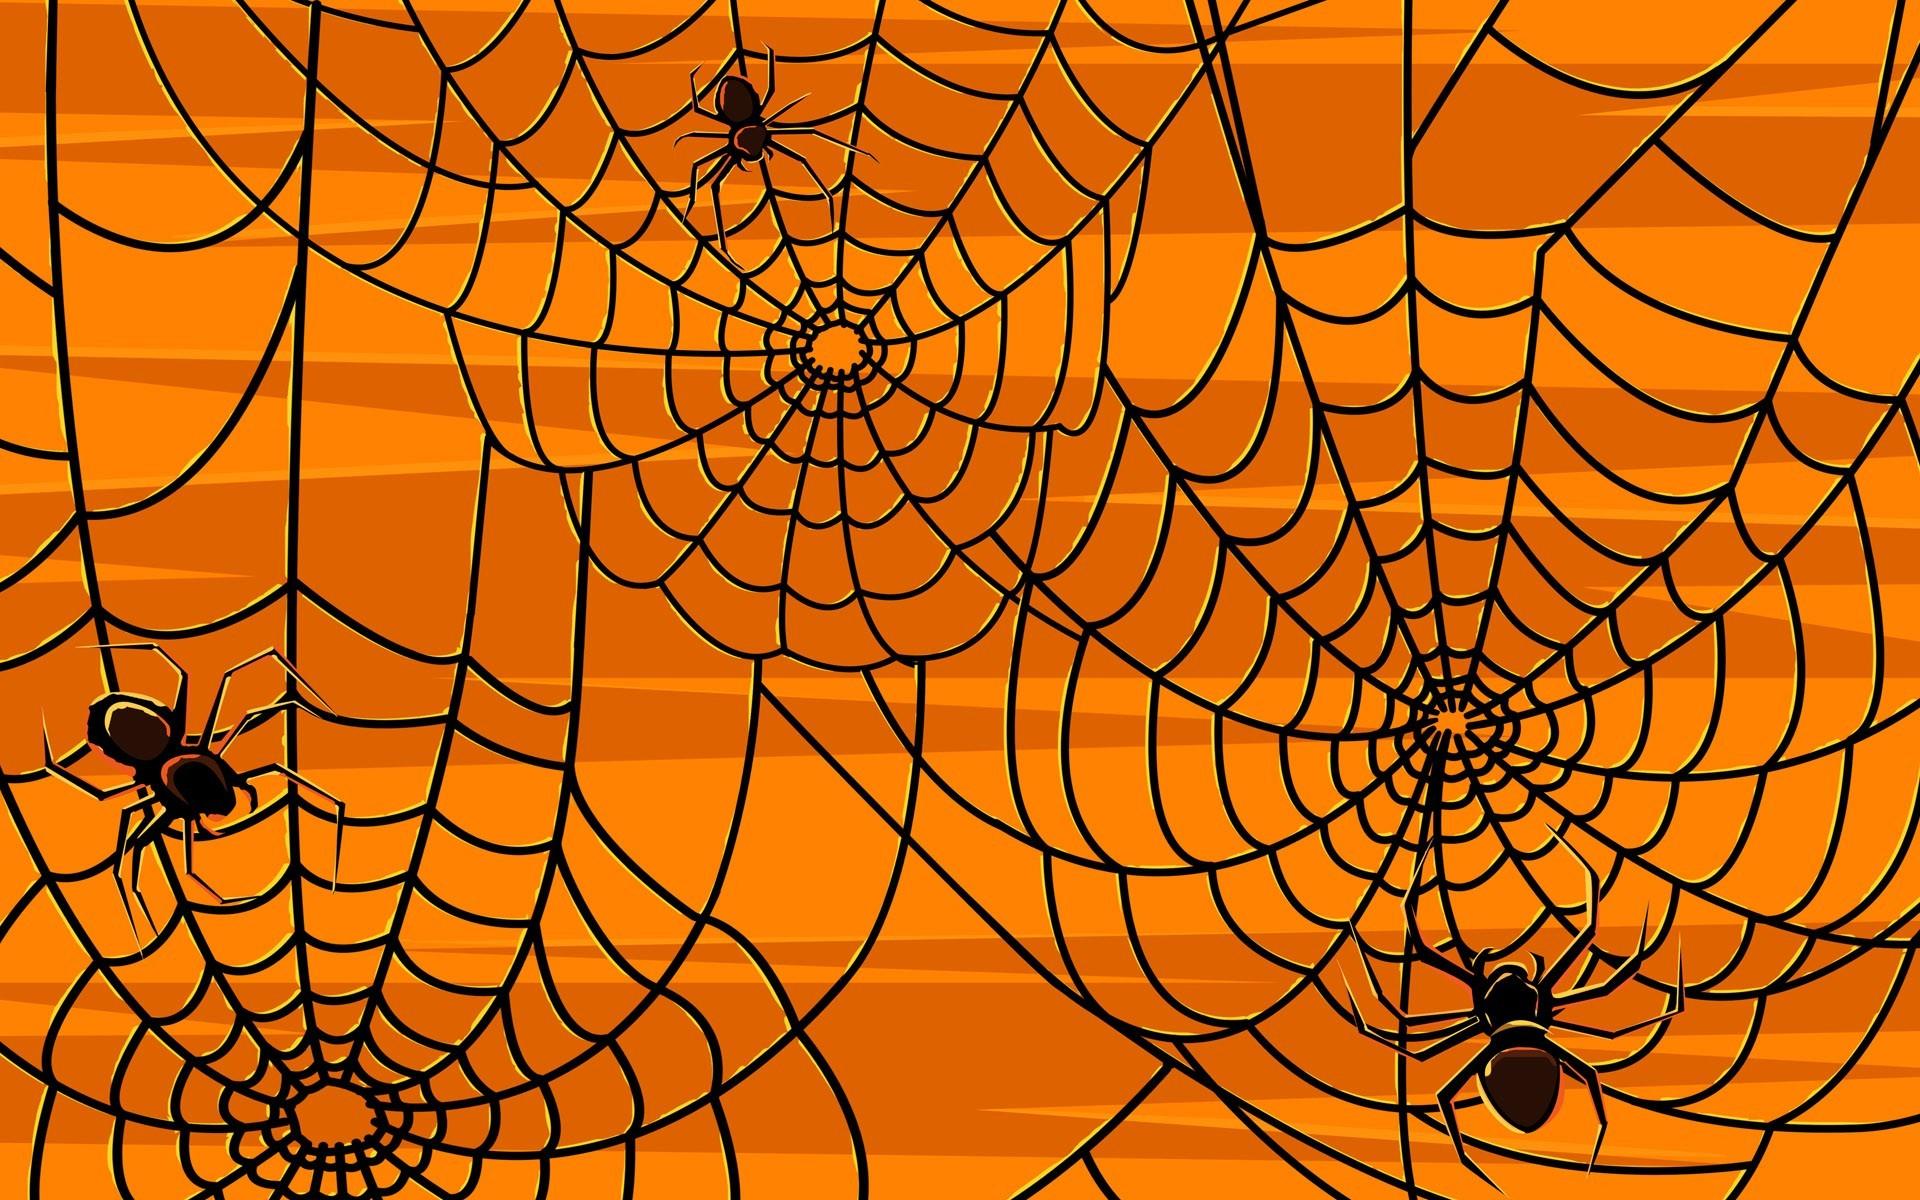 Halloween Widescreen Wallpaper for Desktop – WallpaperSafari. Halloween  Widescreen Wallpaper For Desktop WallpaperSafari